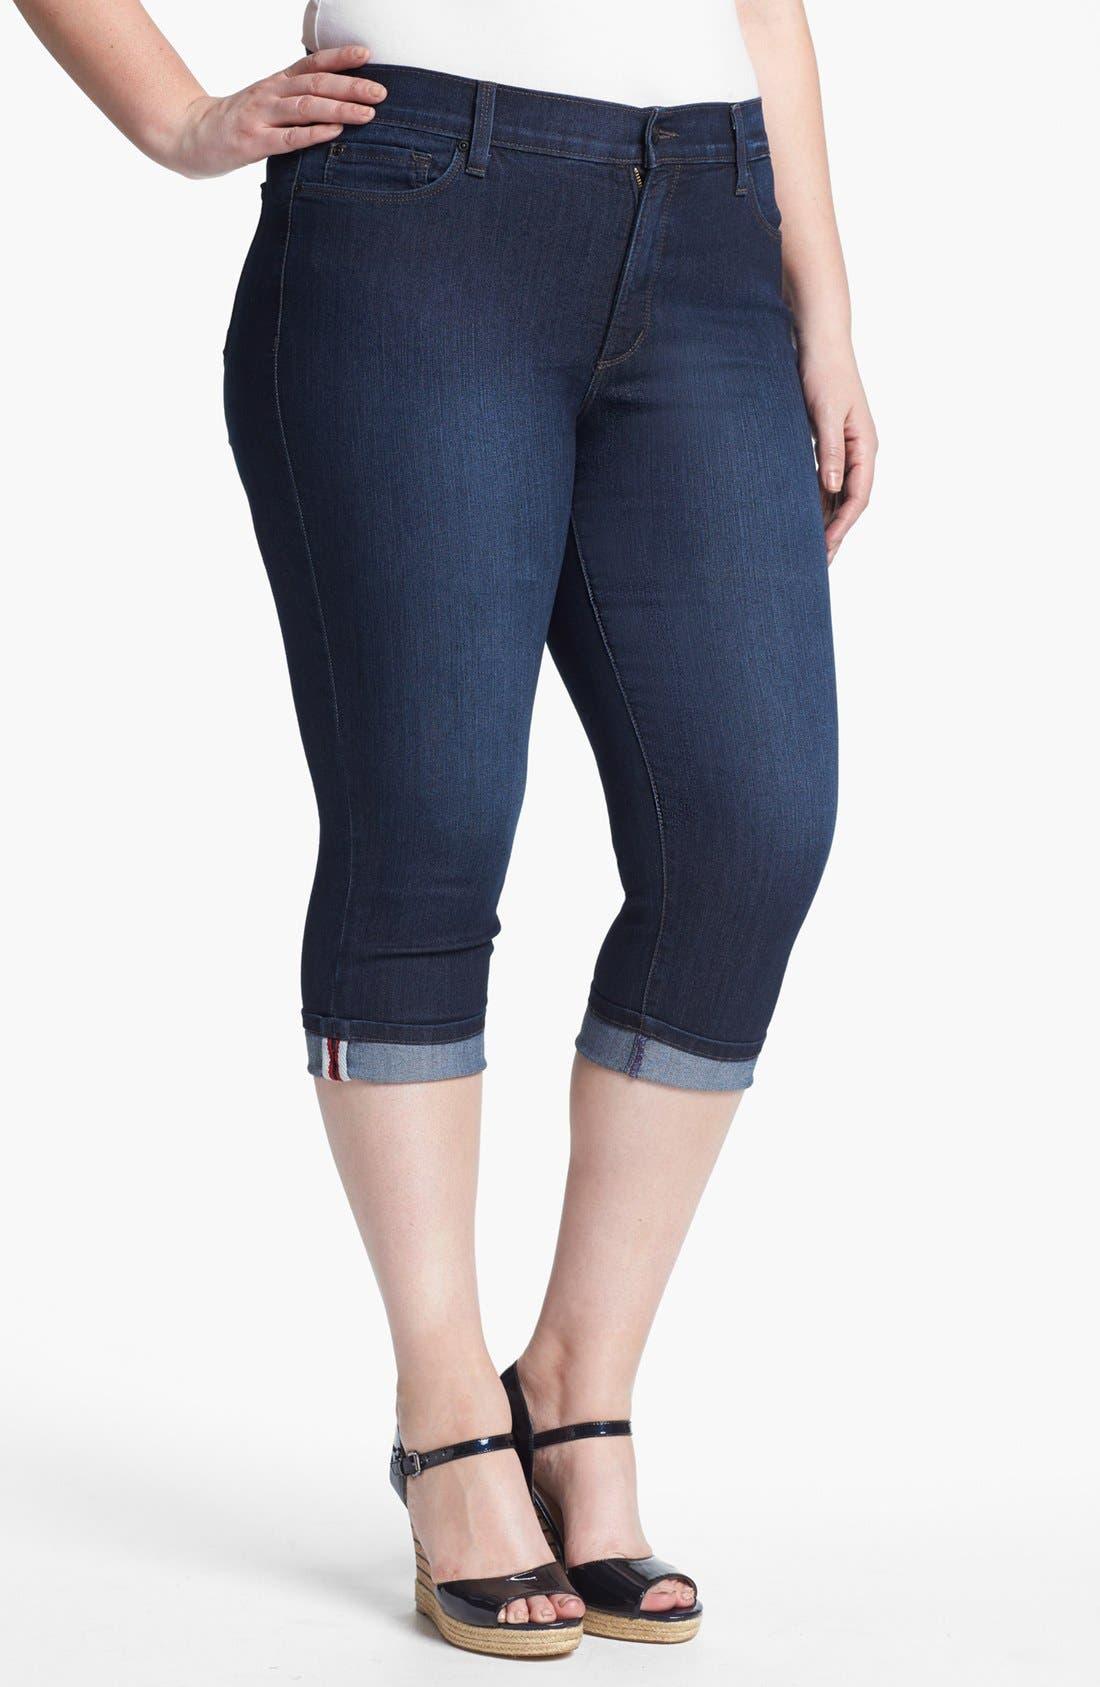 Alternate Image 1 Selected - NYDJ 'Edna' Cuff Crop Jeans (Plus Size)